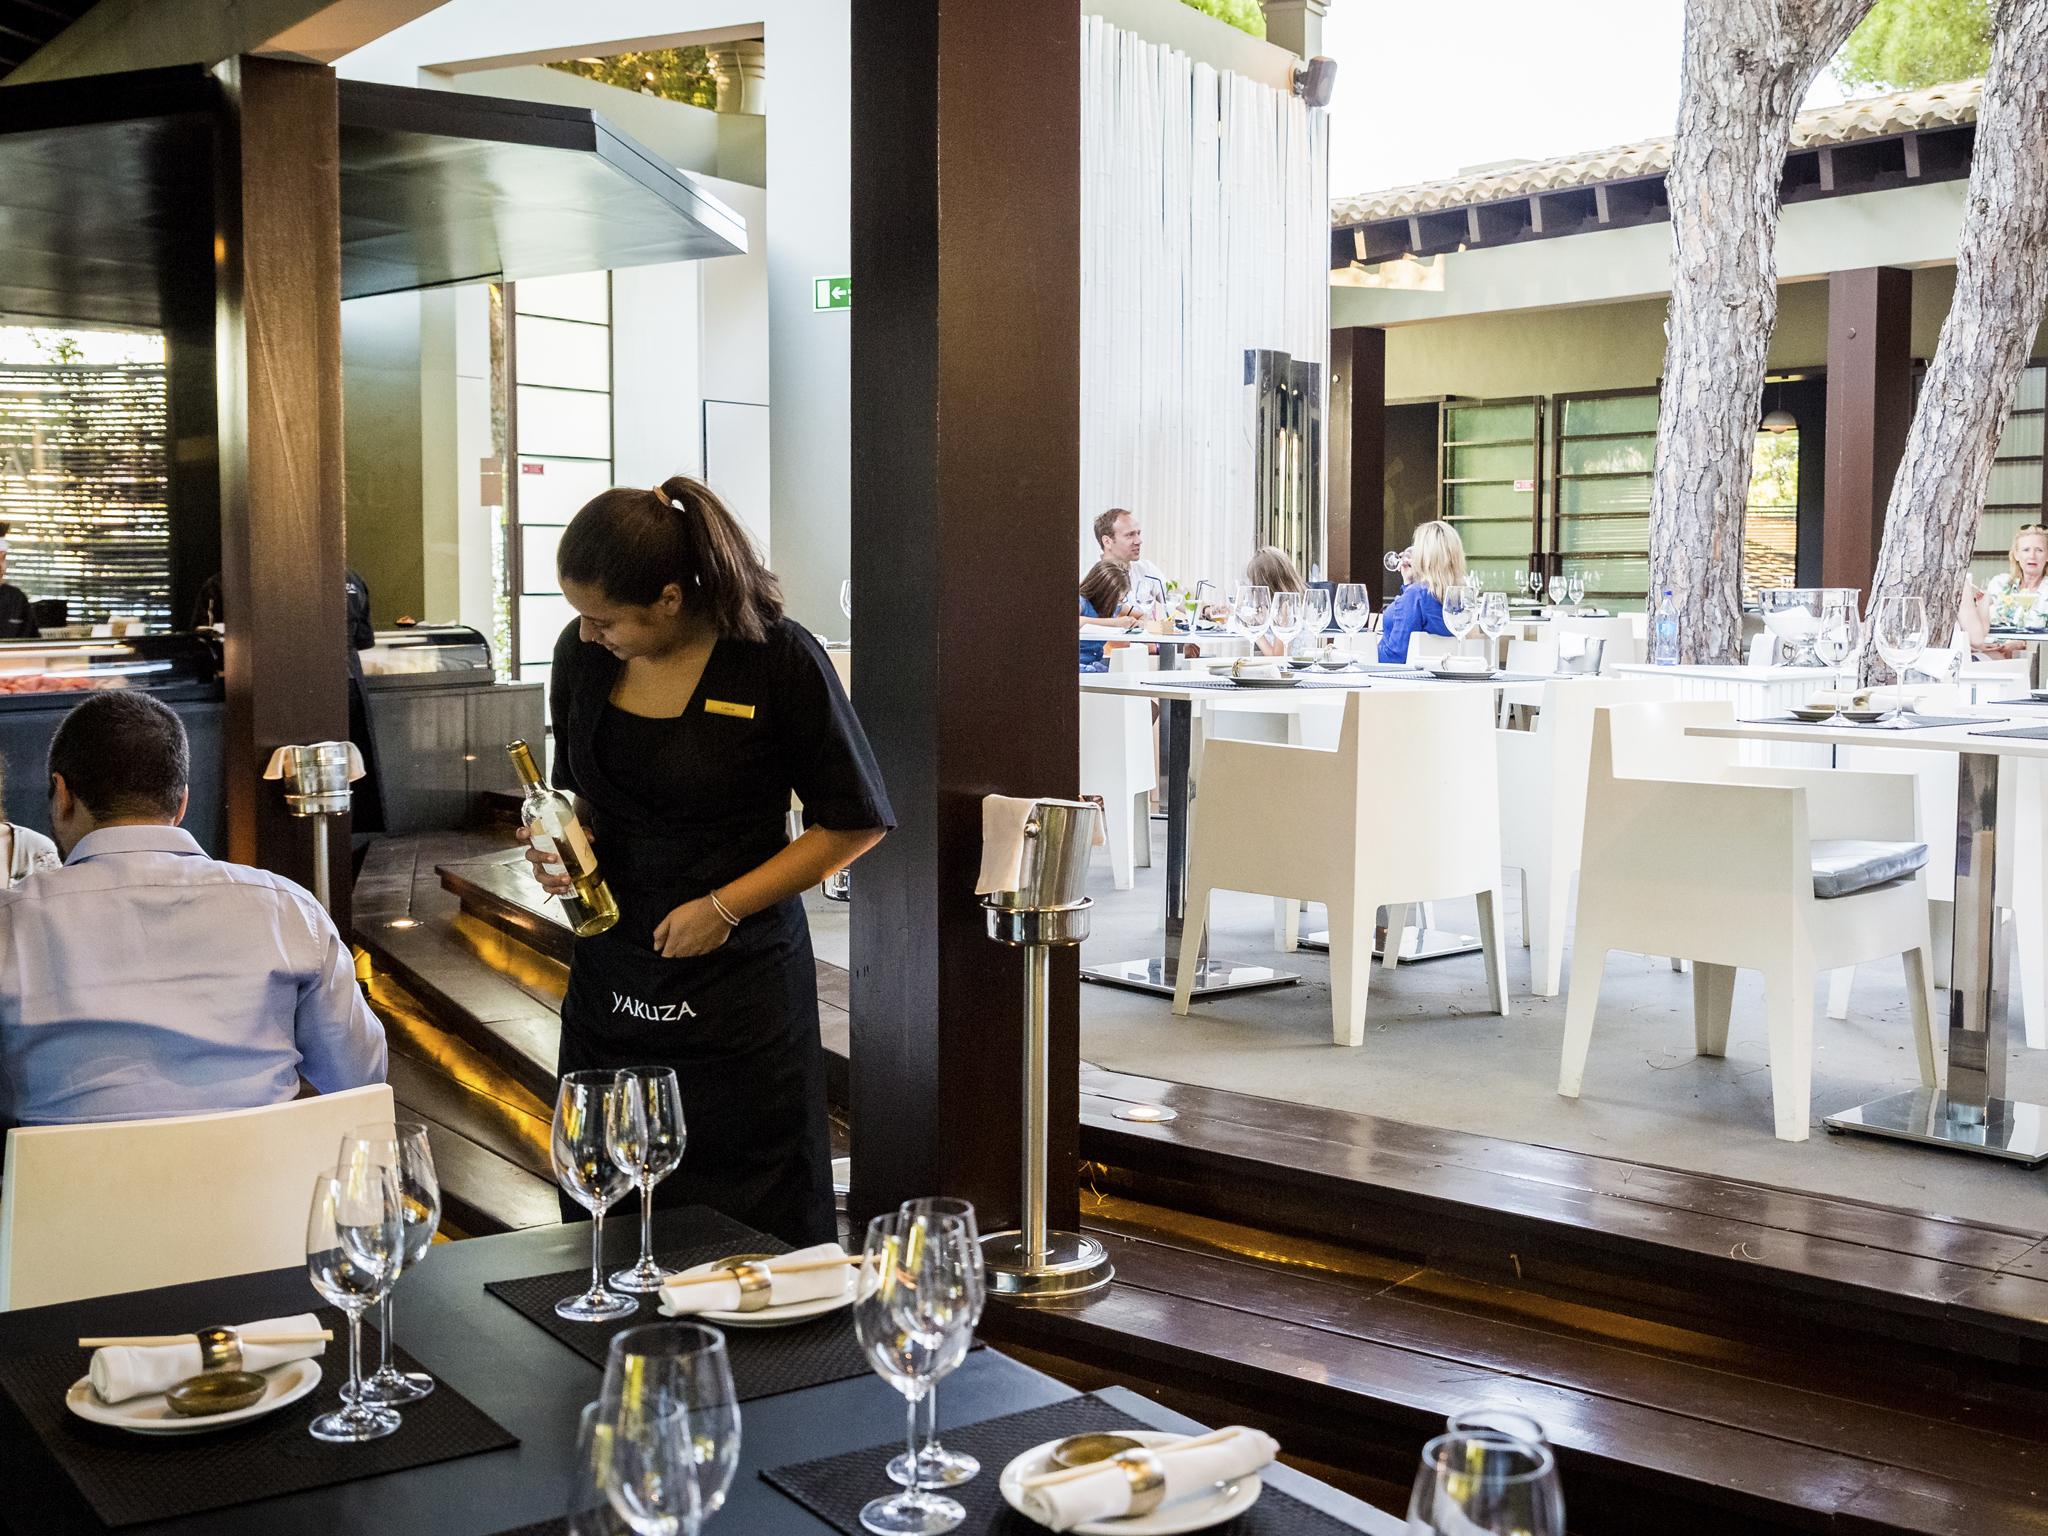 Faça check-in nestes restaurantes de hotel no Algarve